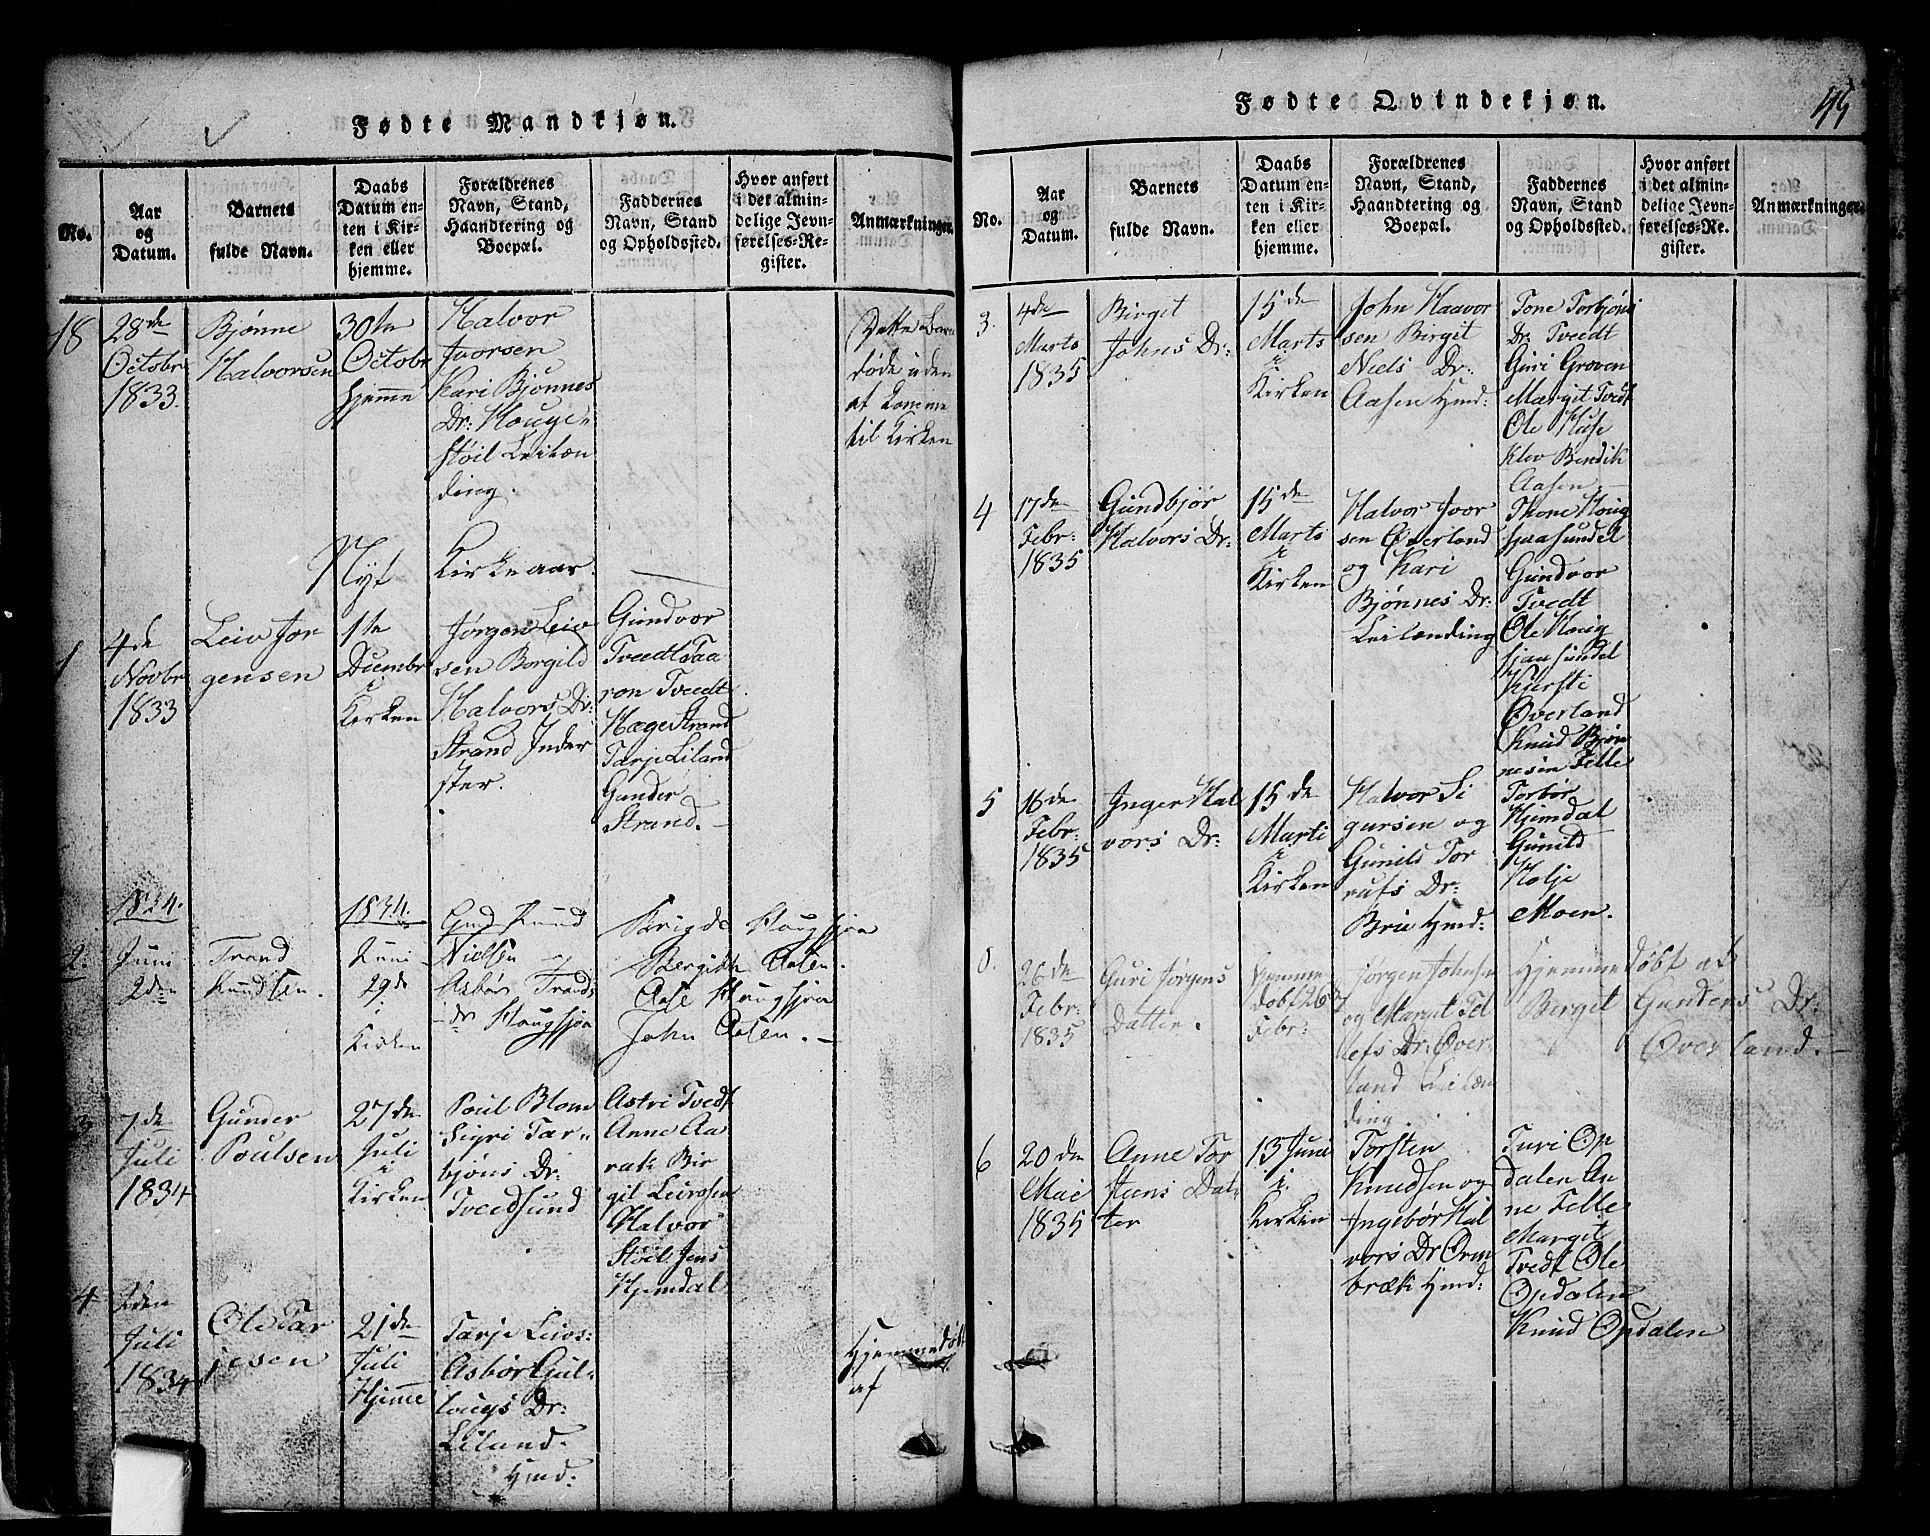 SAKO, Nissedal kirkebøker, G/Gb/L0001: Klokkerbok nr. II 1, 1814-1862, s. 45